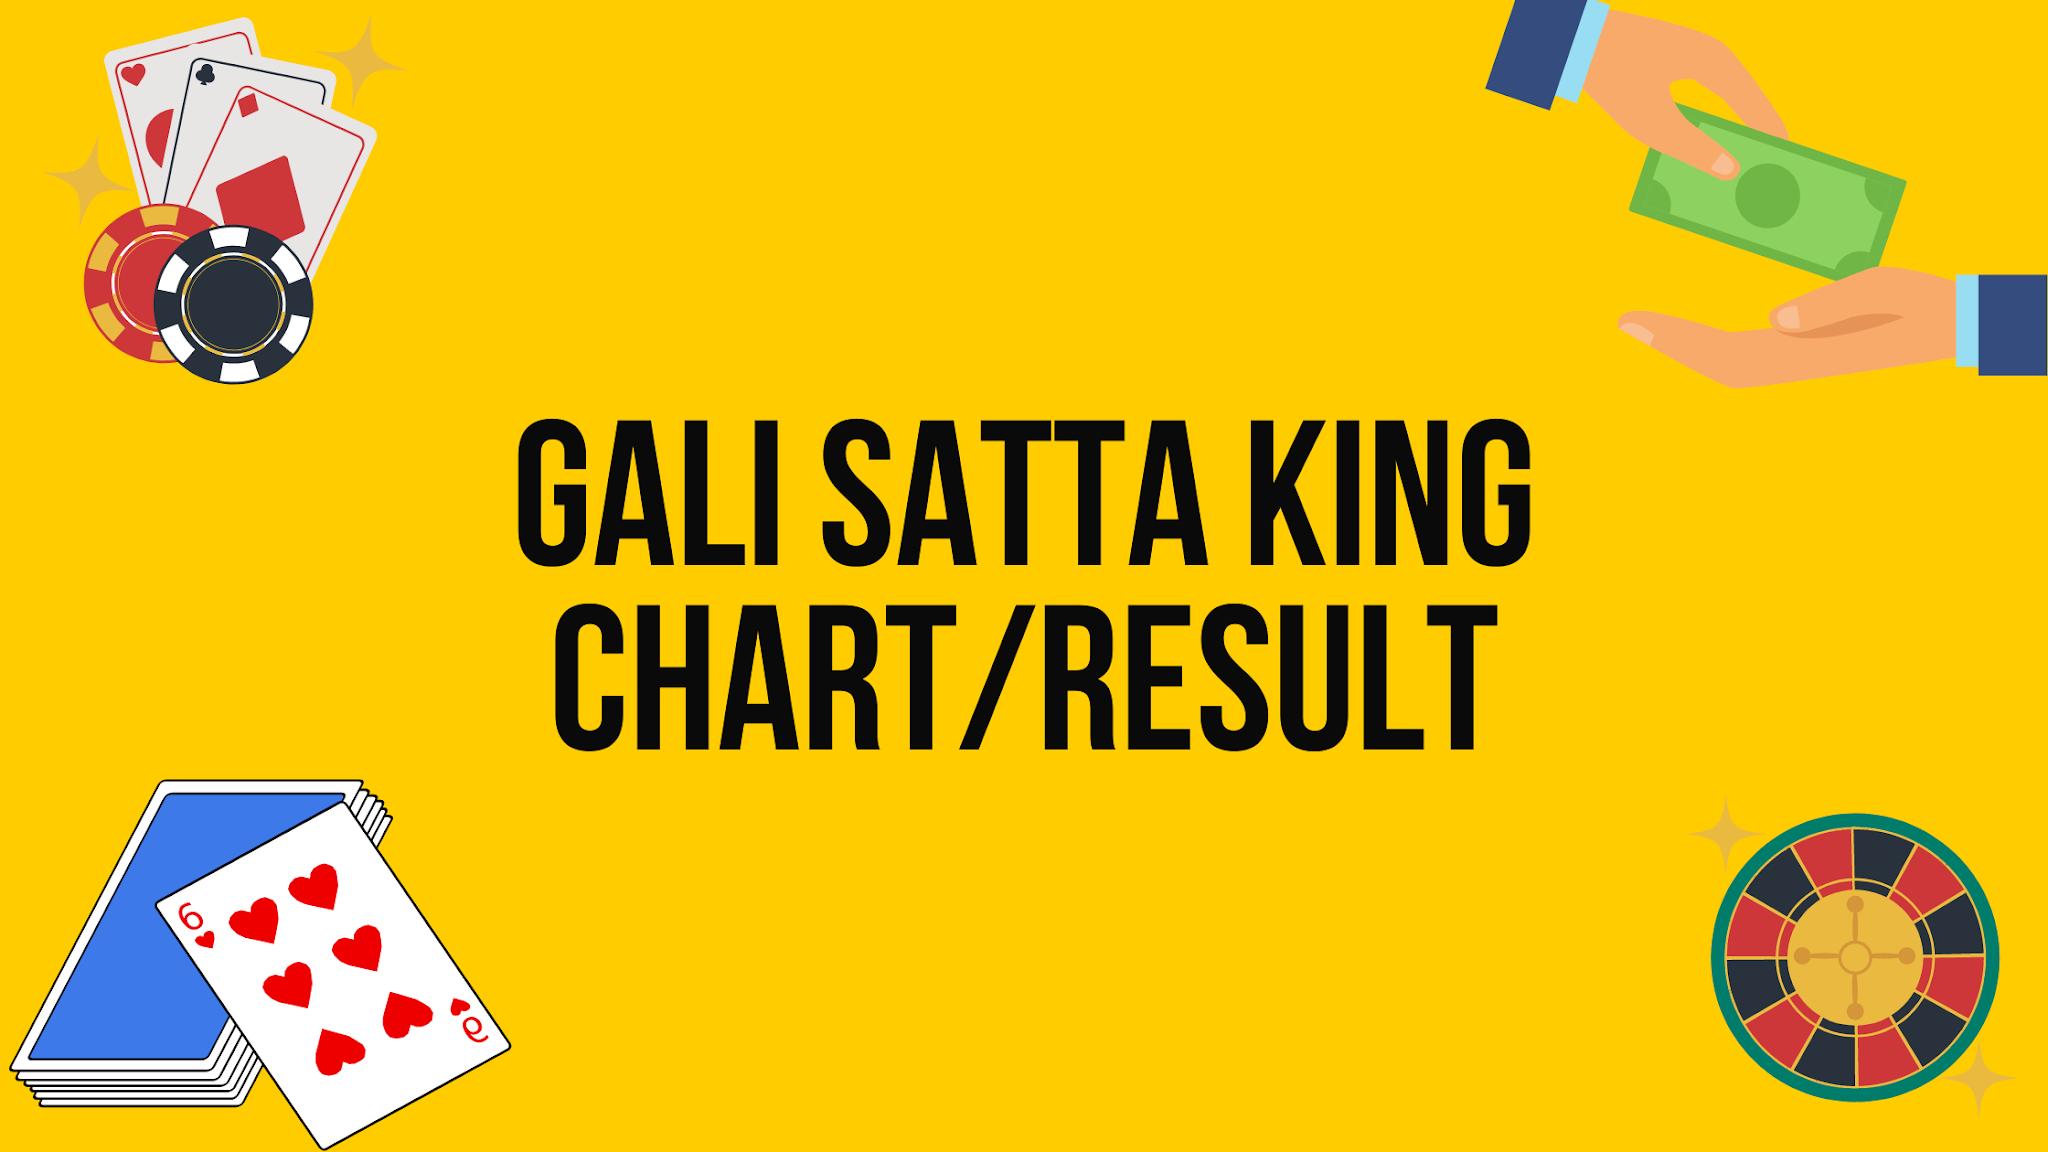 Gali Satta King Chart | Gali Satta King | Satta King 786 ...